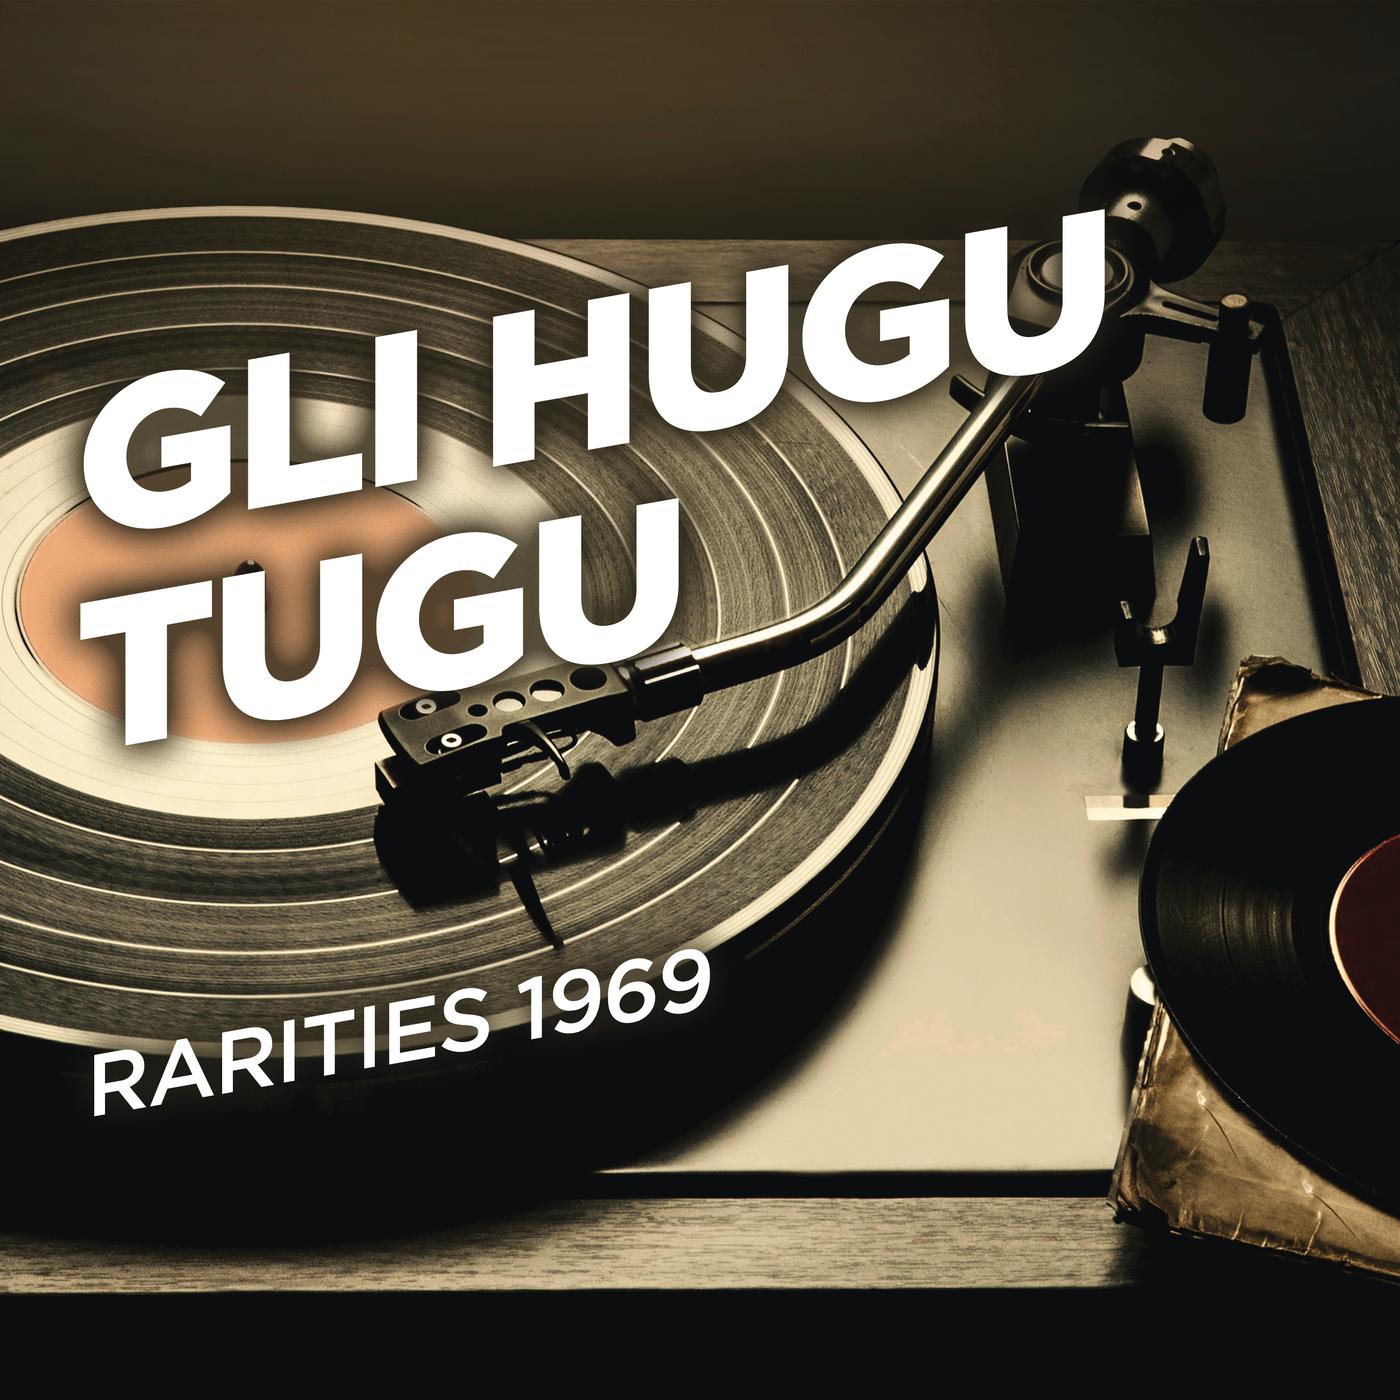 Rarities 1969 - Gli Hugu Tugu